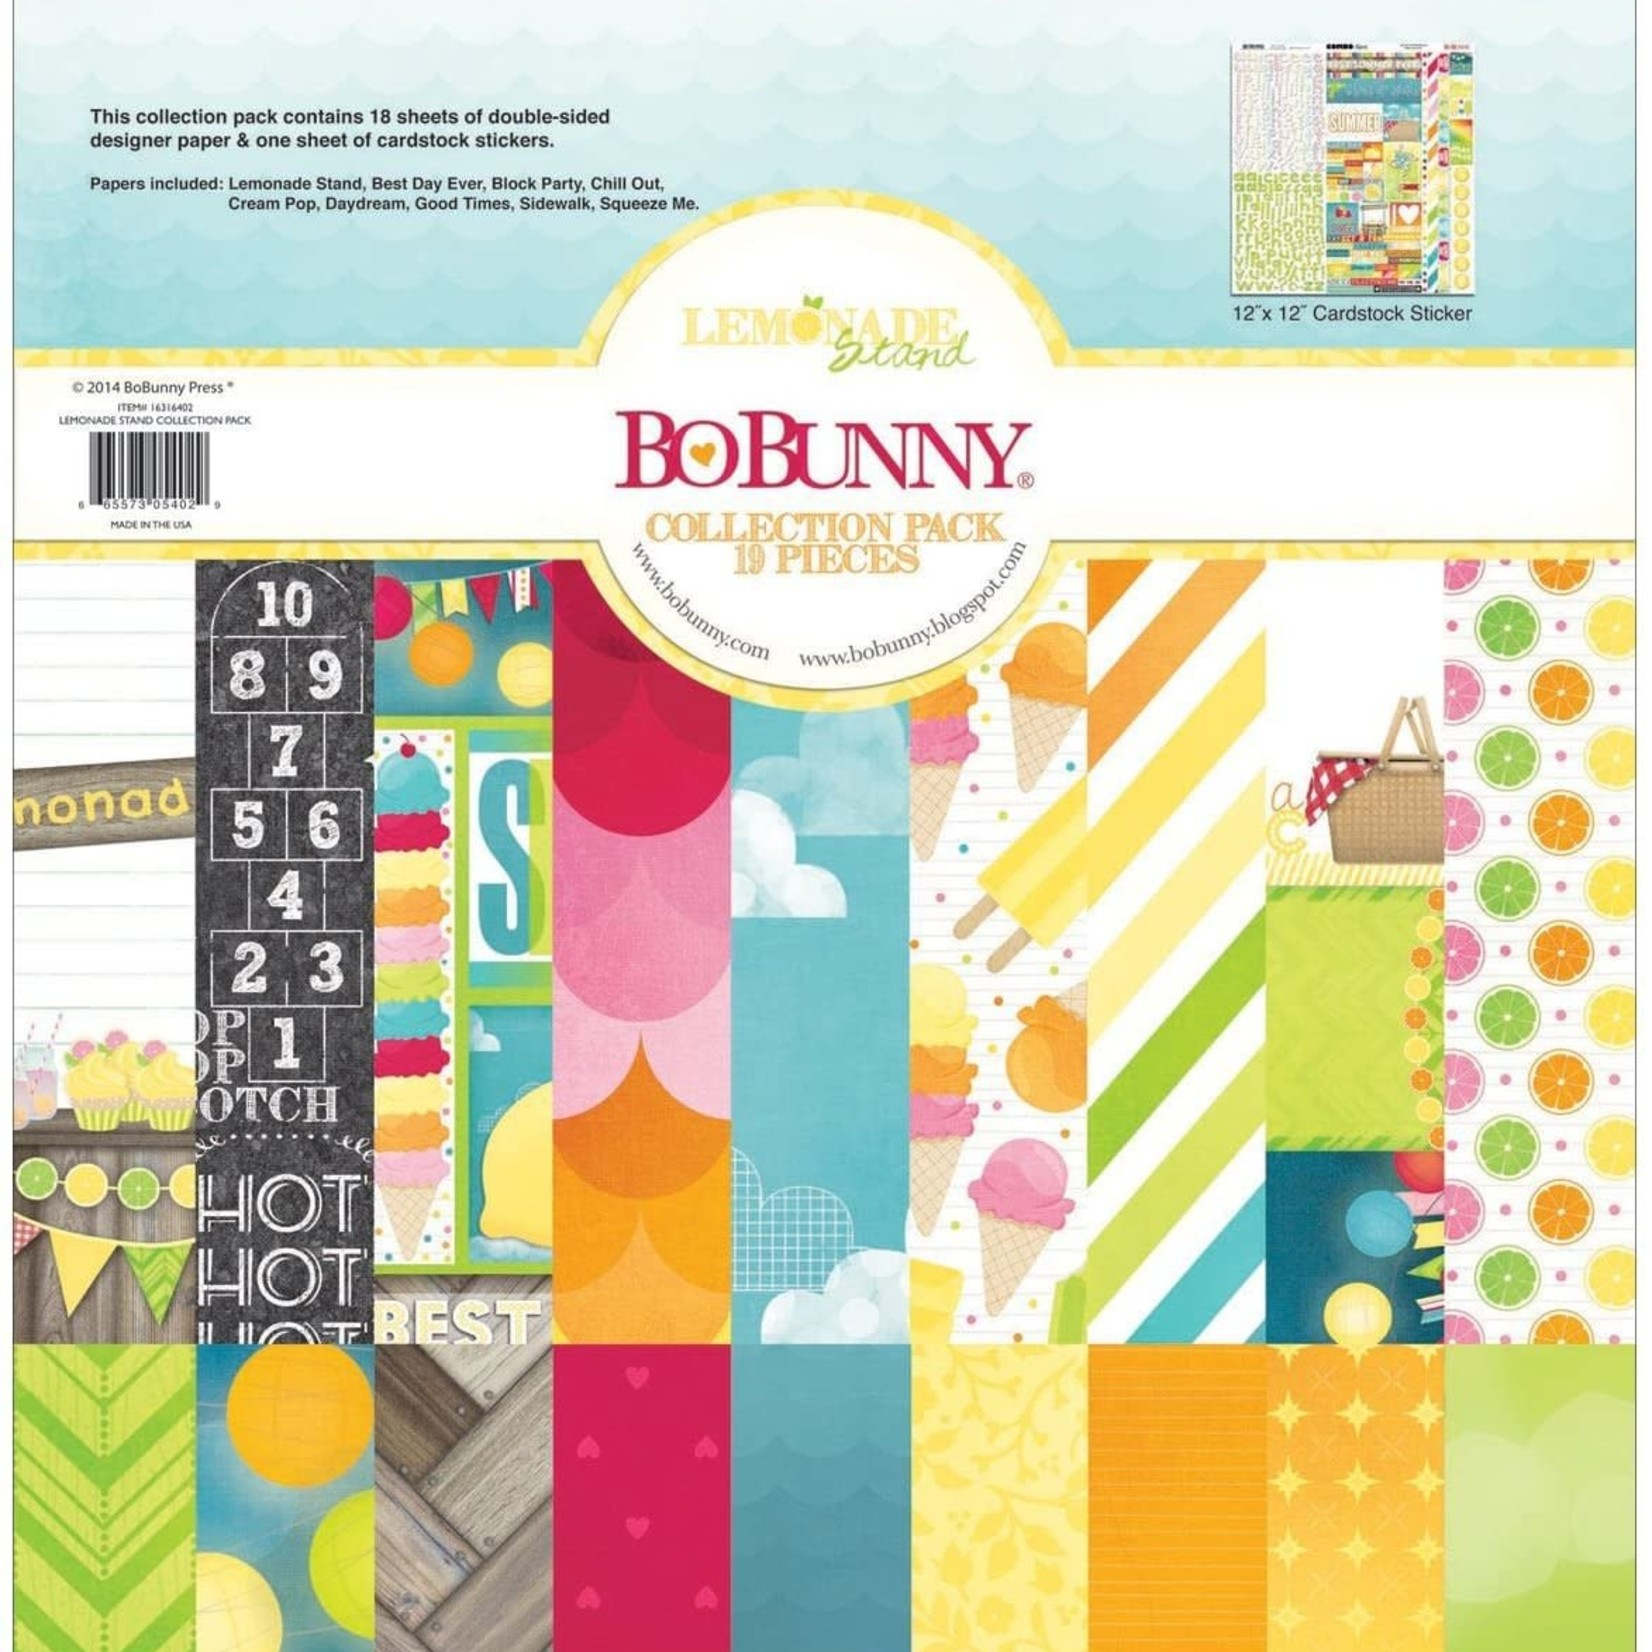 BoBunny BoBunny - Collection Pack - Lenonade Stand